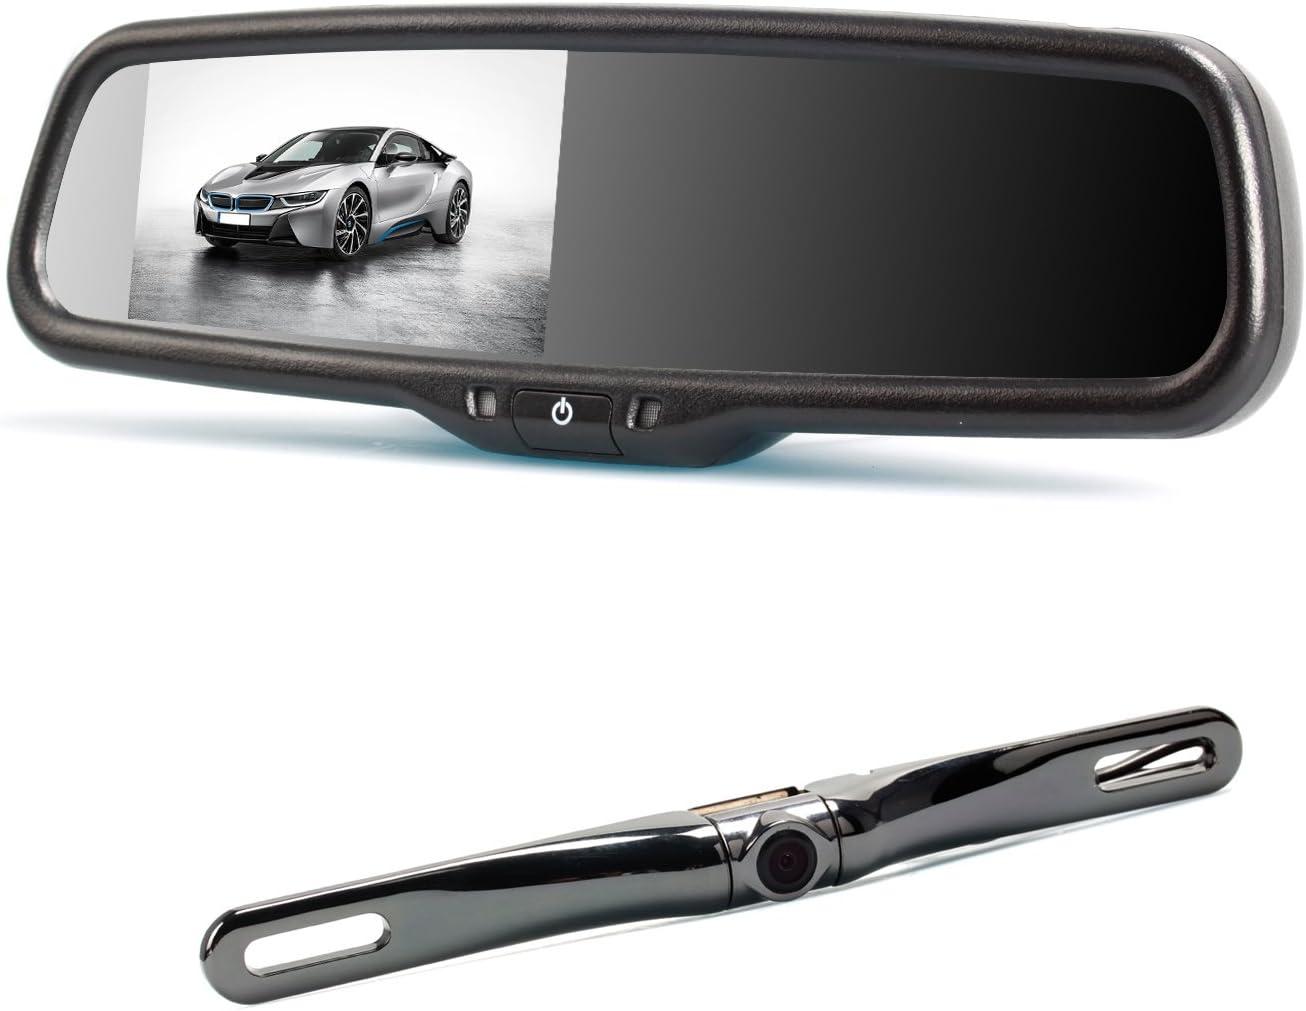 Auto Vox 2 Video Input 10 9 Cm Lcd Auto Rückfahrkamera Spiegel Monitor Mit Wasserdicht Backup Kamera Für Dodge Ram Pickup Volvo Auto